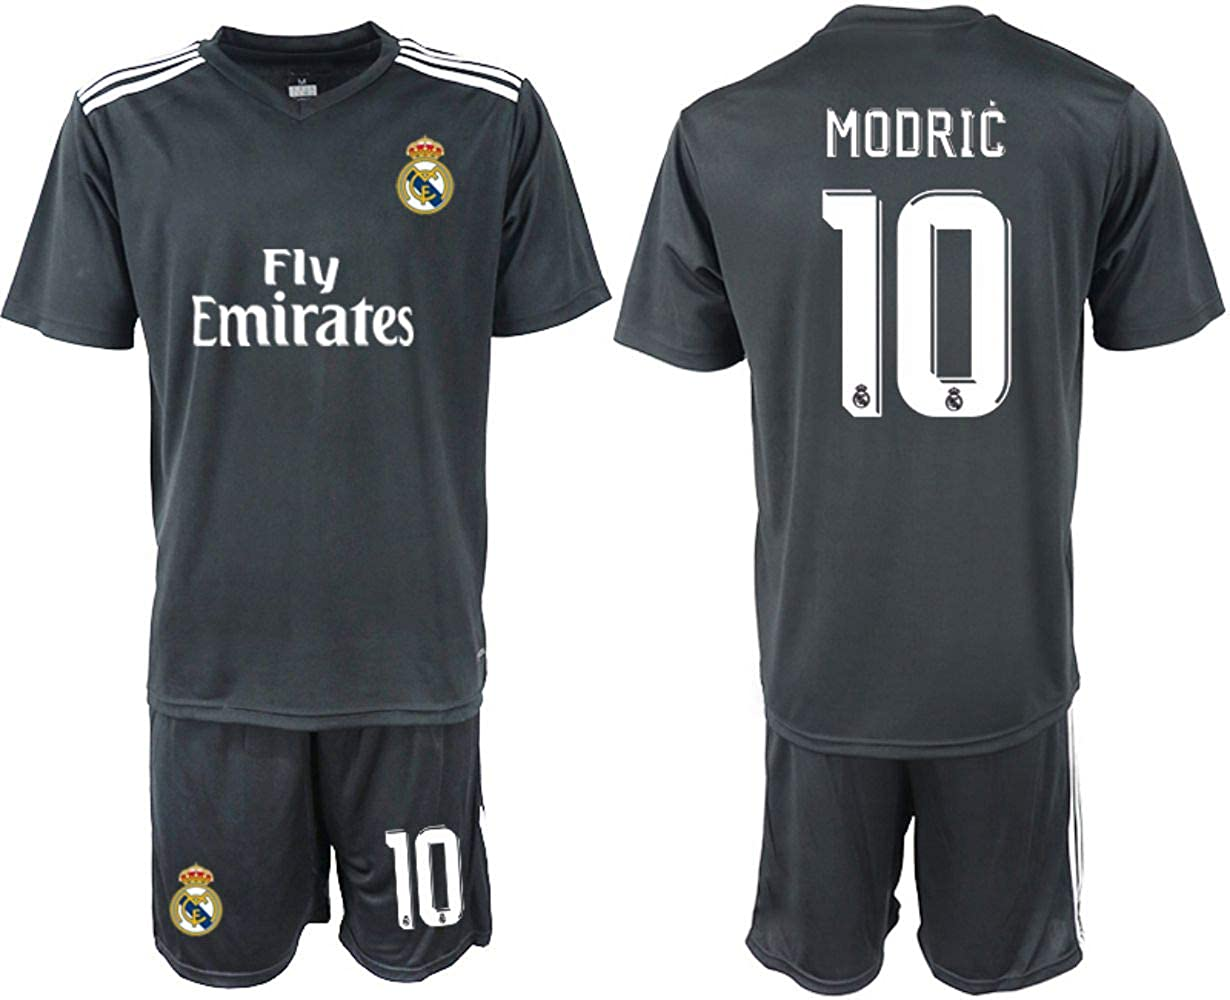 2018-2019 New Real Madrid Modric Kid's Soccer Jersey